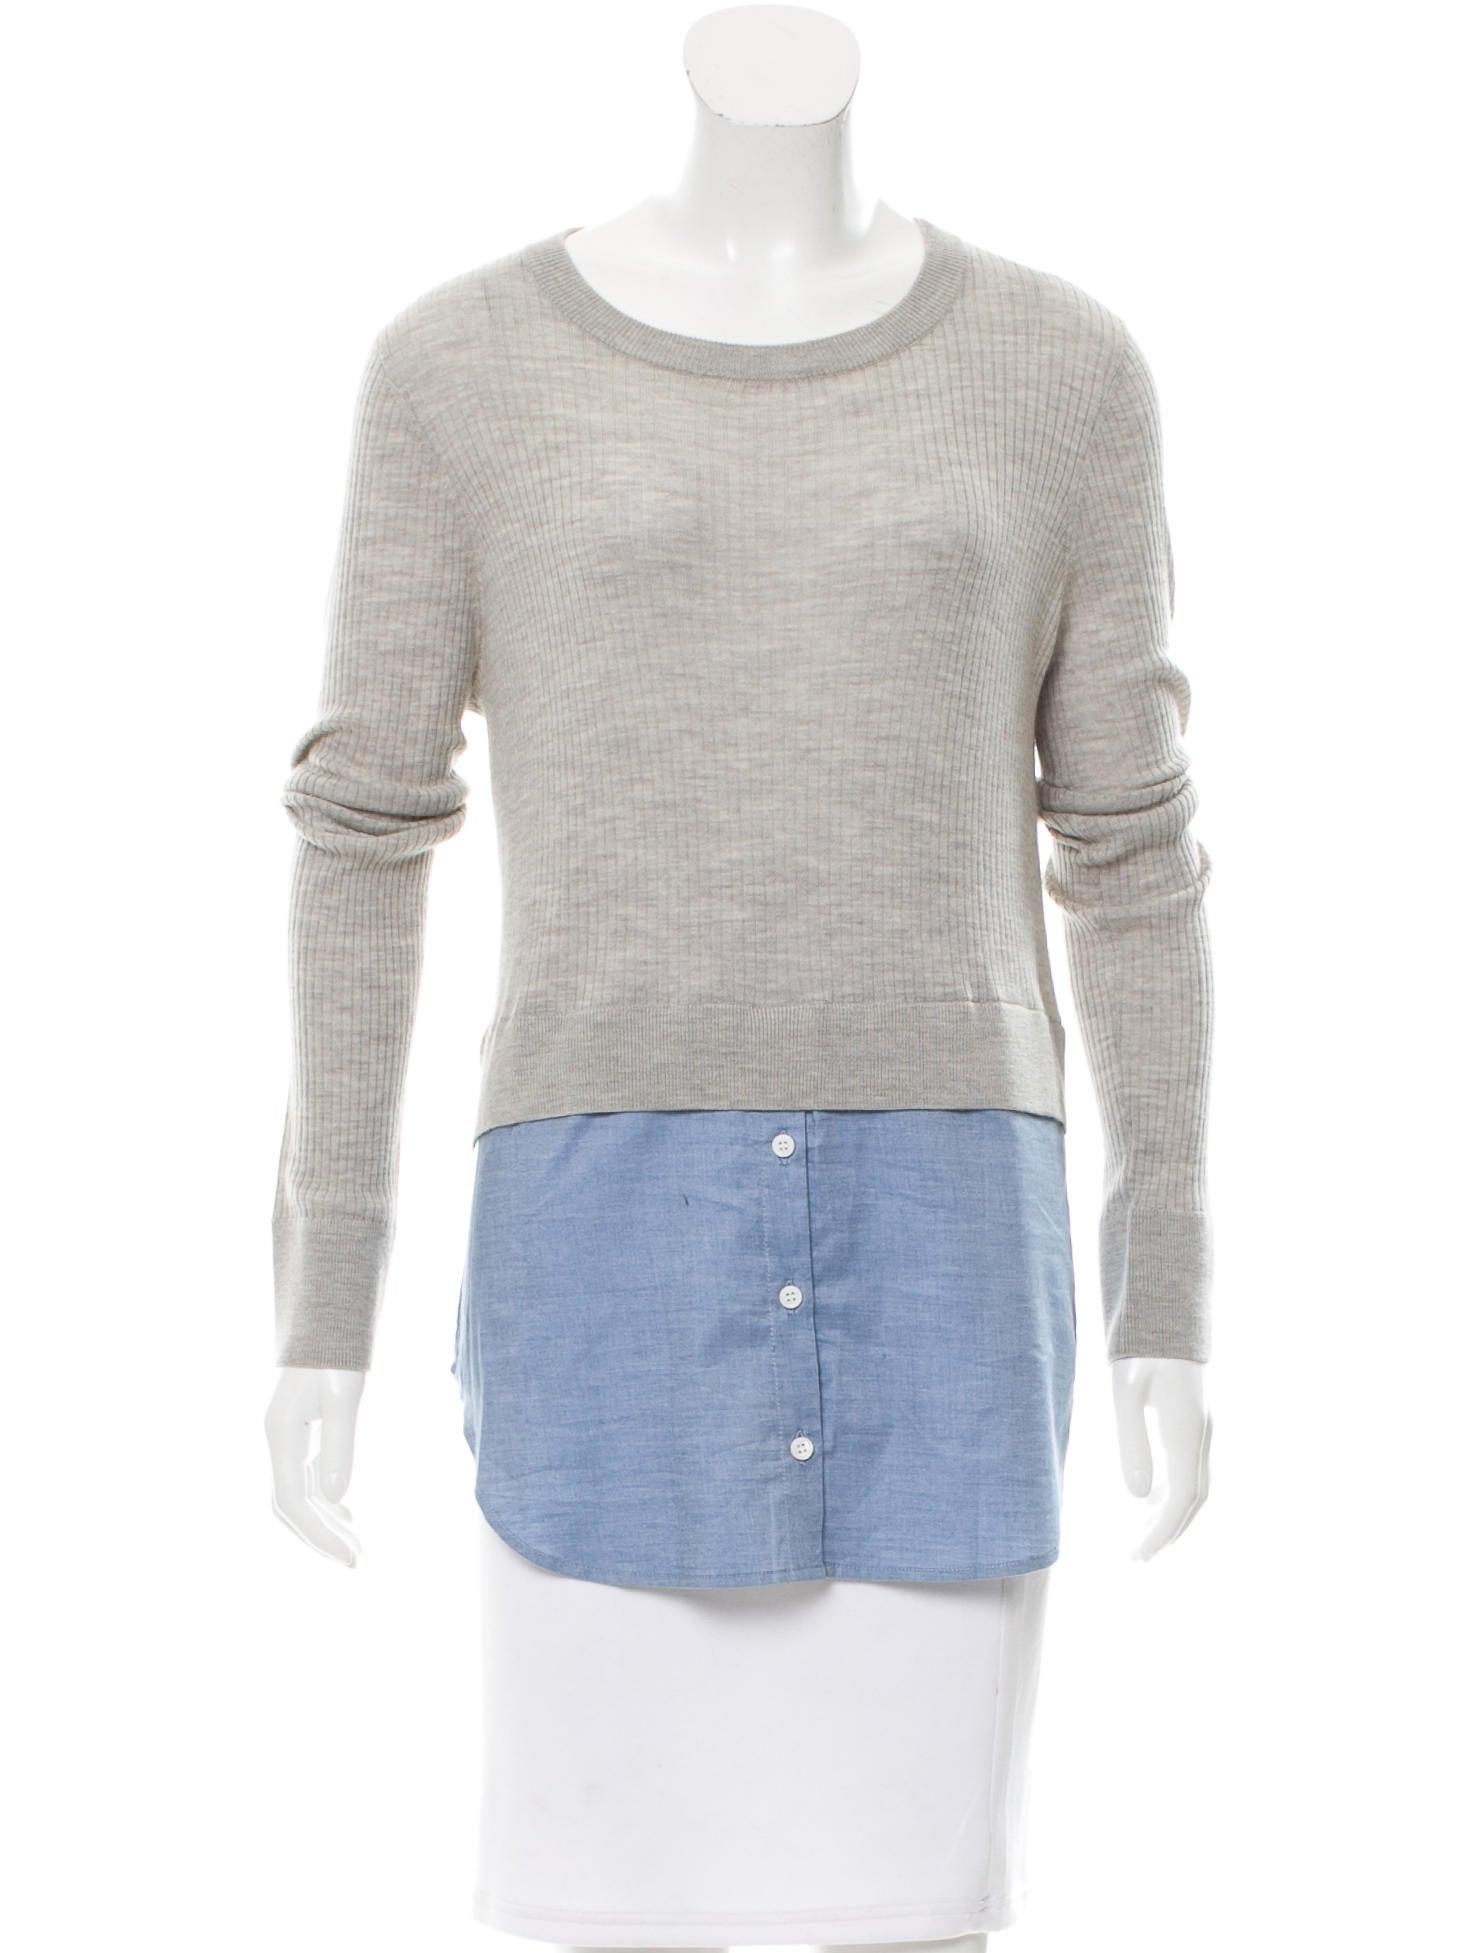 Veronica beard wool poplin top clothing wv123741 the for Best wool shirt jackets